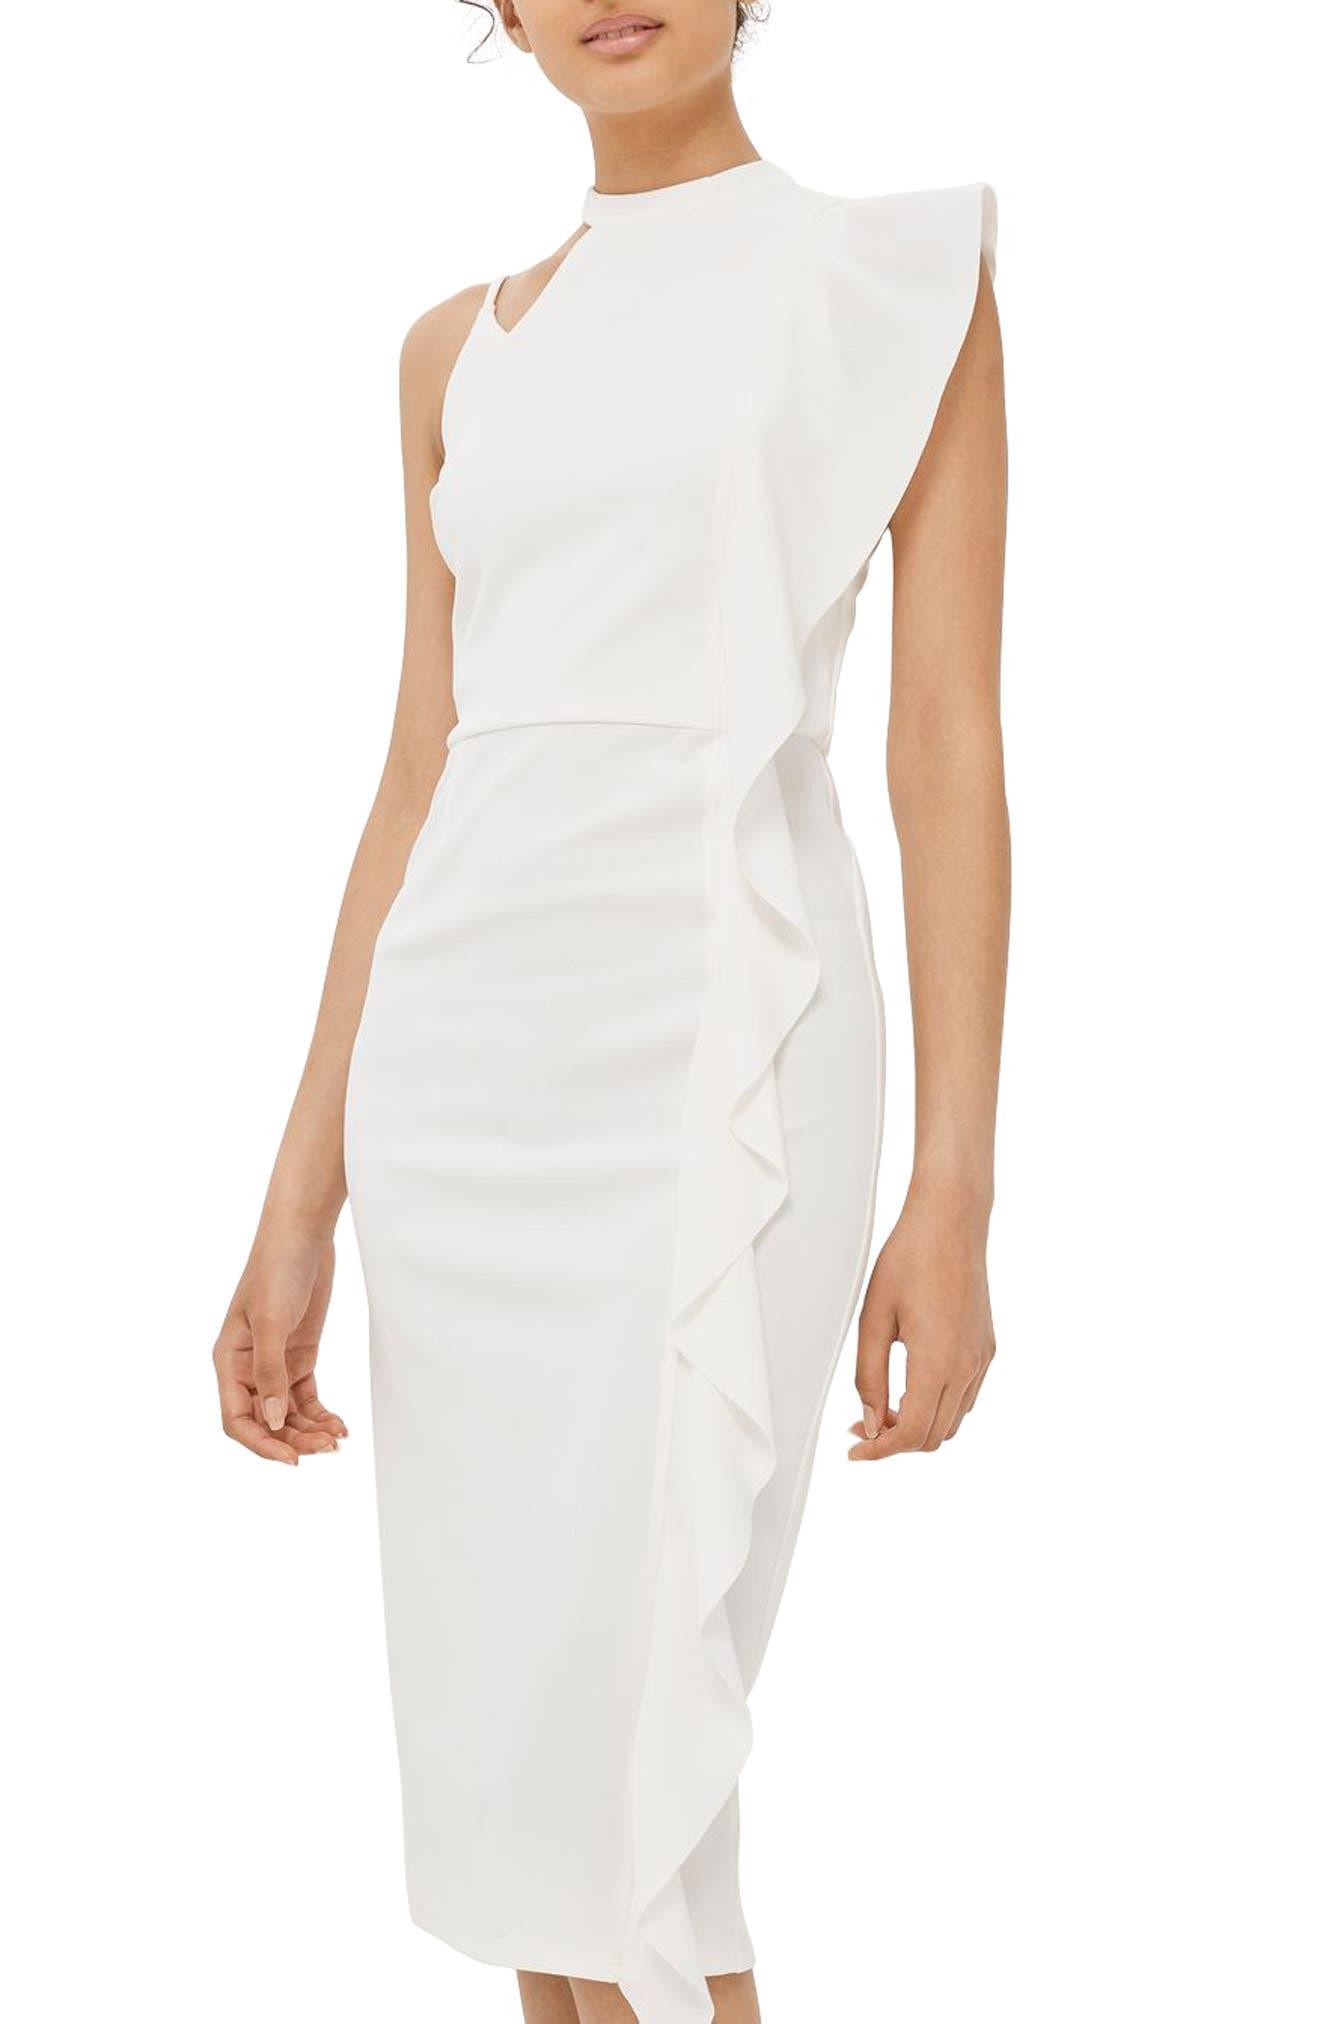 Alternate Image 1 Selected - Topshop Asymmetrical Ruffle Midi Dress